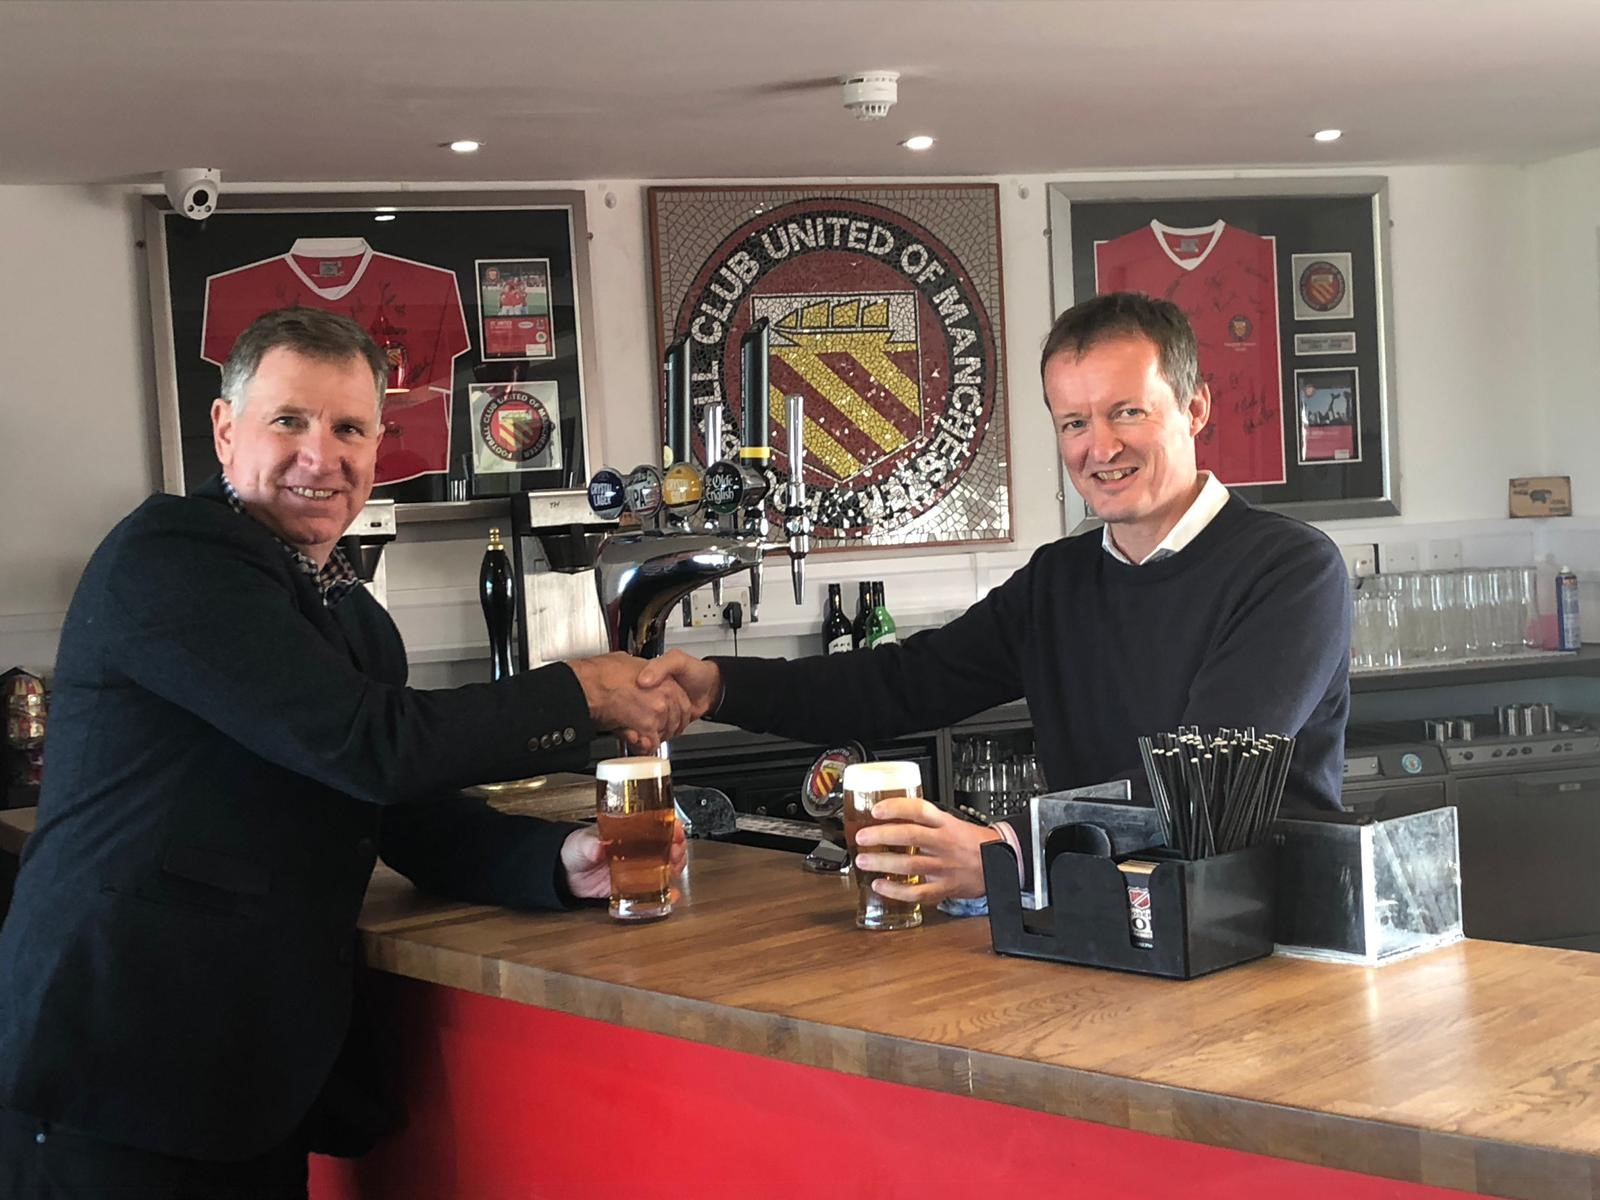 John Thompson FC united deal